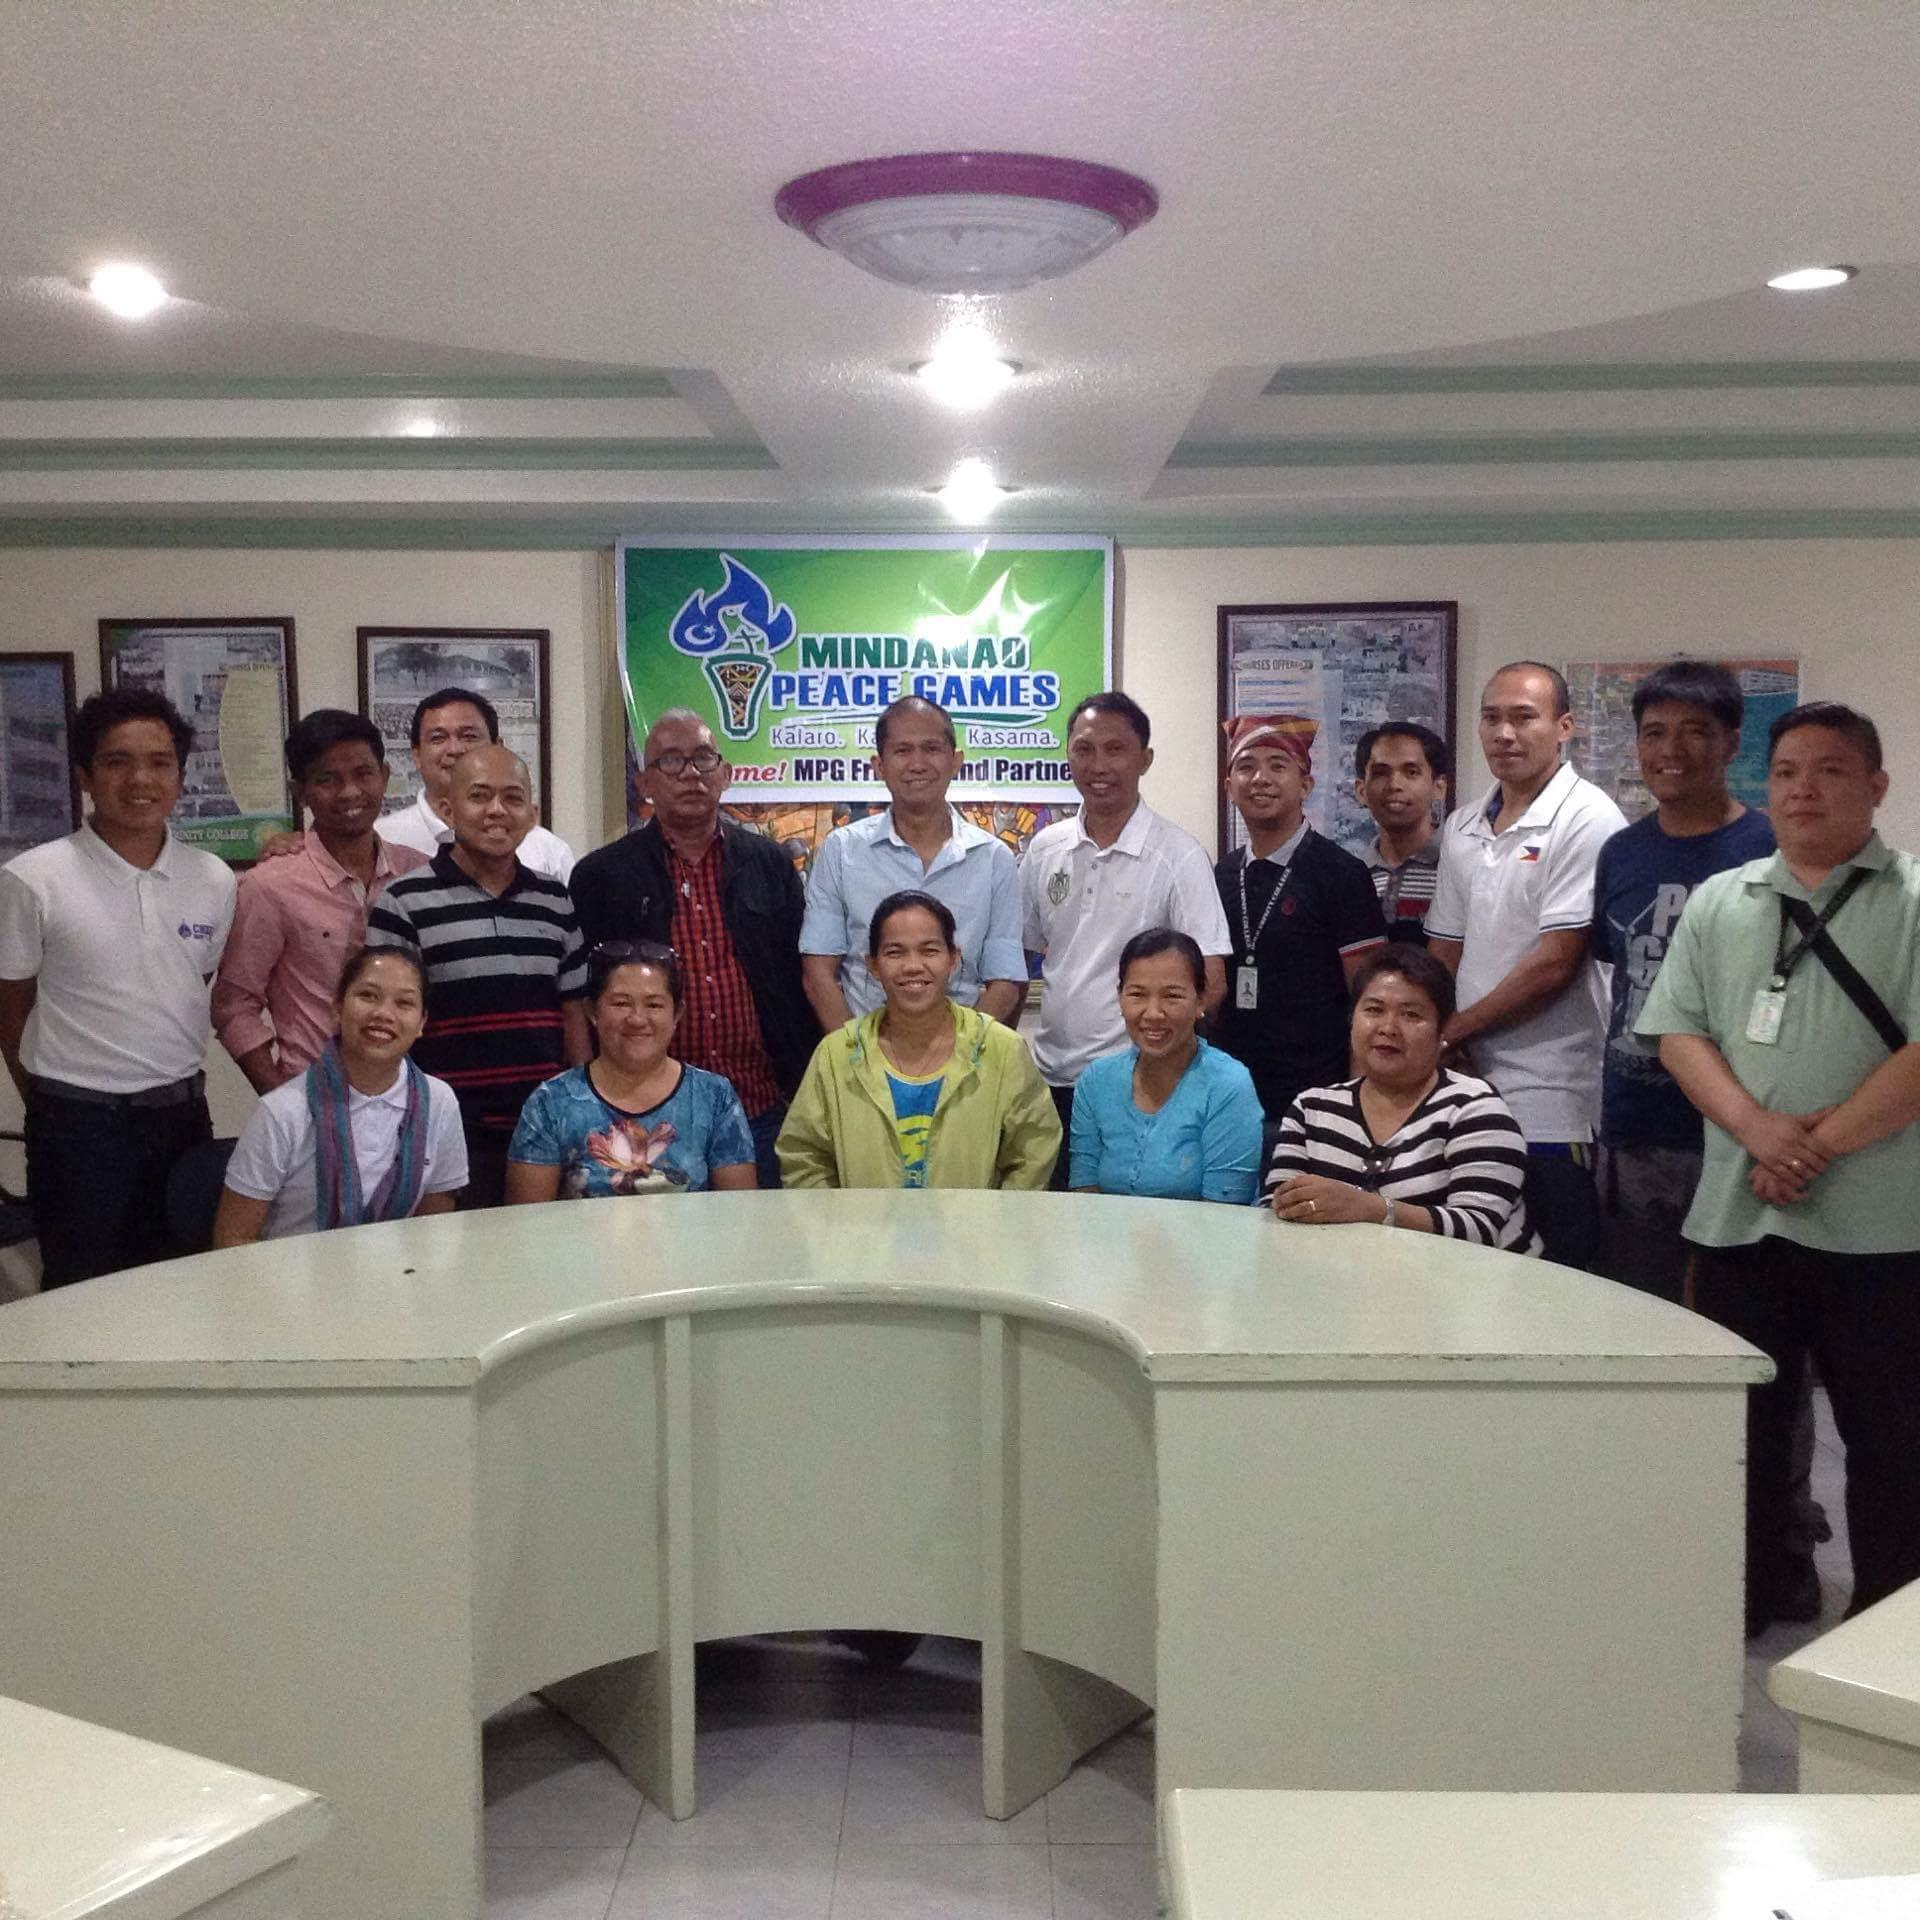 THROUGH THE EYES OF A COACH: Coach Al Rashid and the Mindanao Peace Games